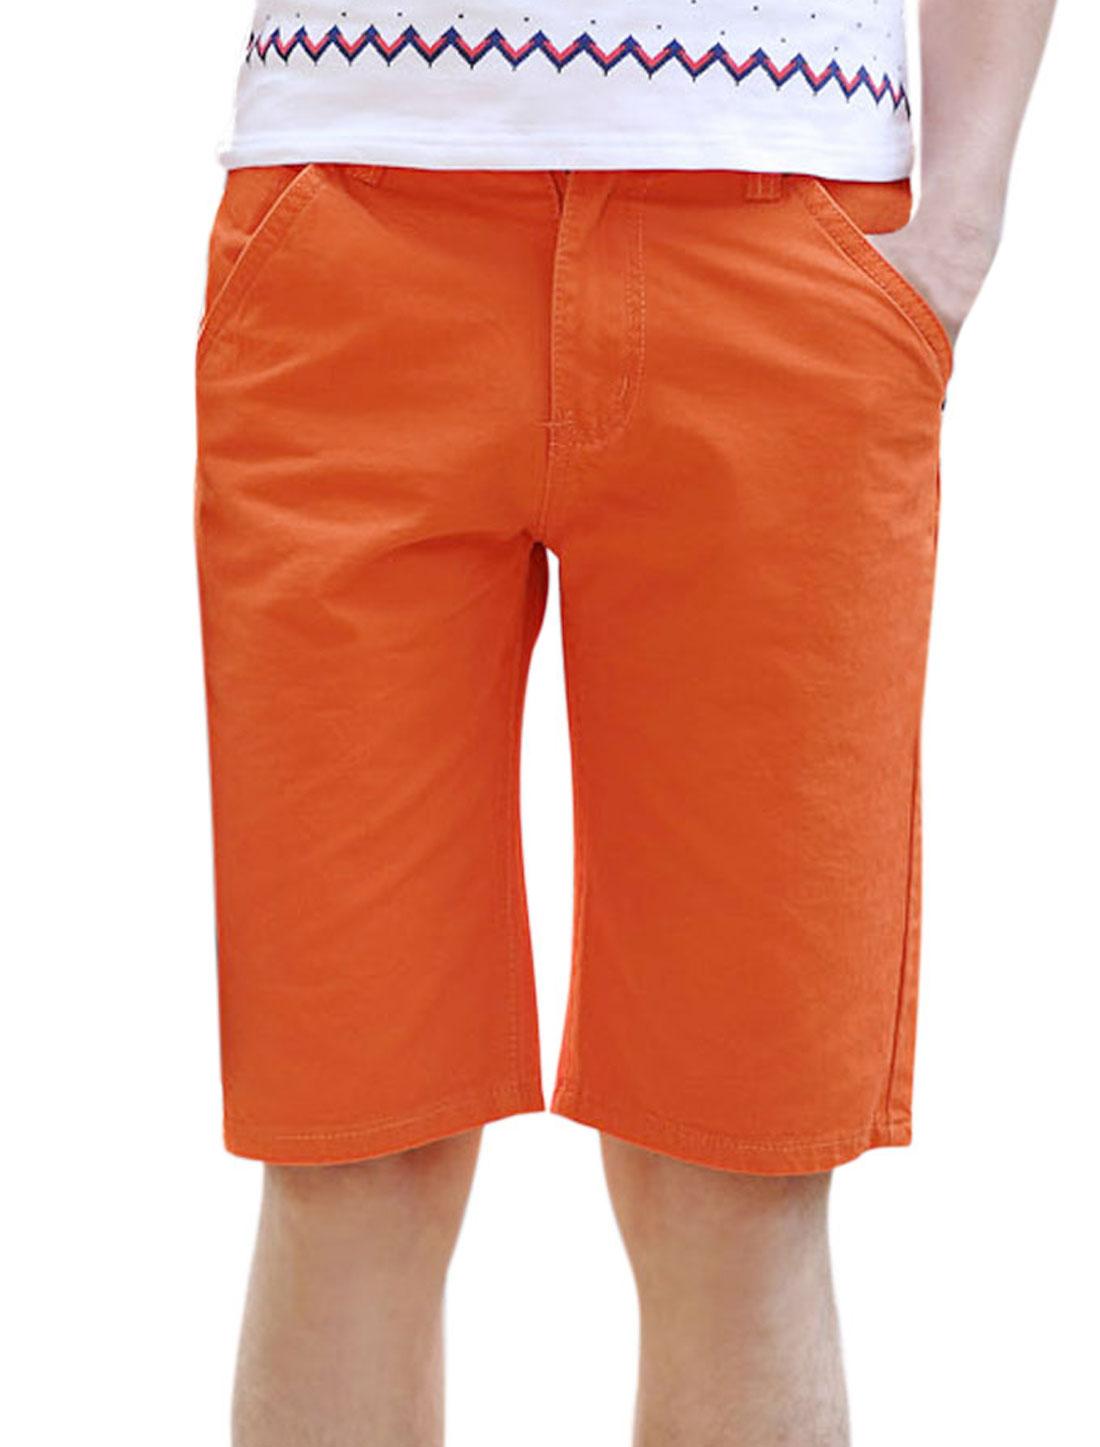 Men Mid Waist Zip Fly Straight Pockets Casual Short Shorts Orange W32